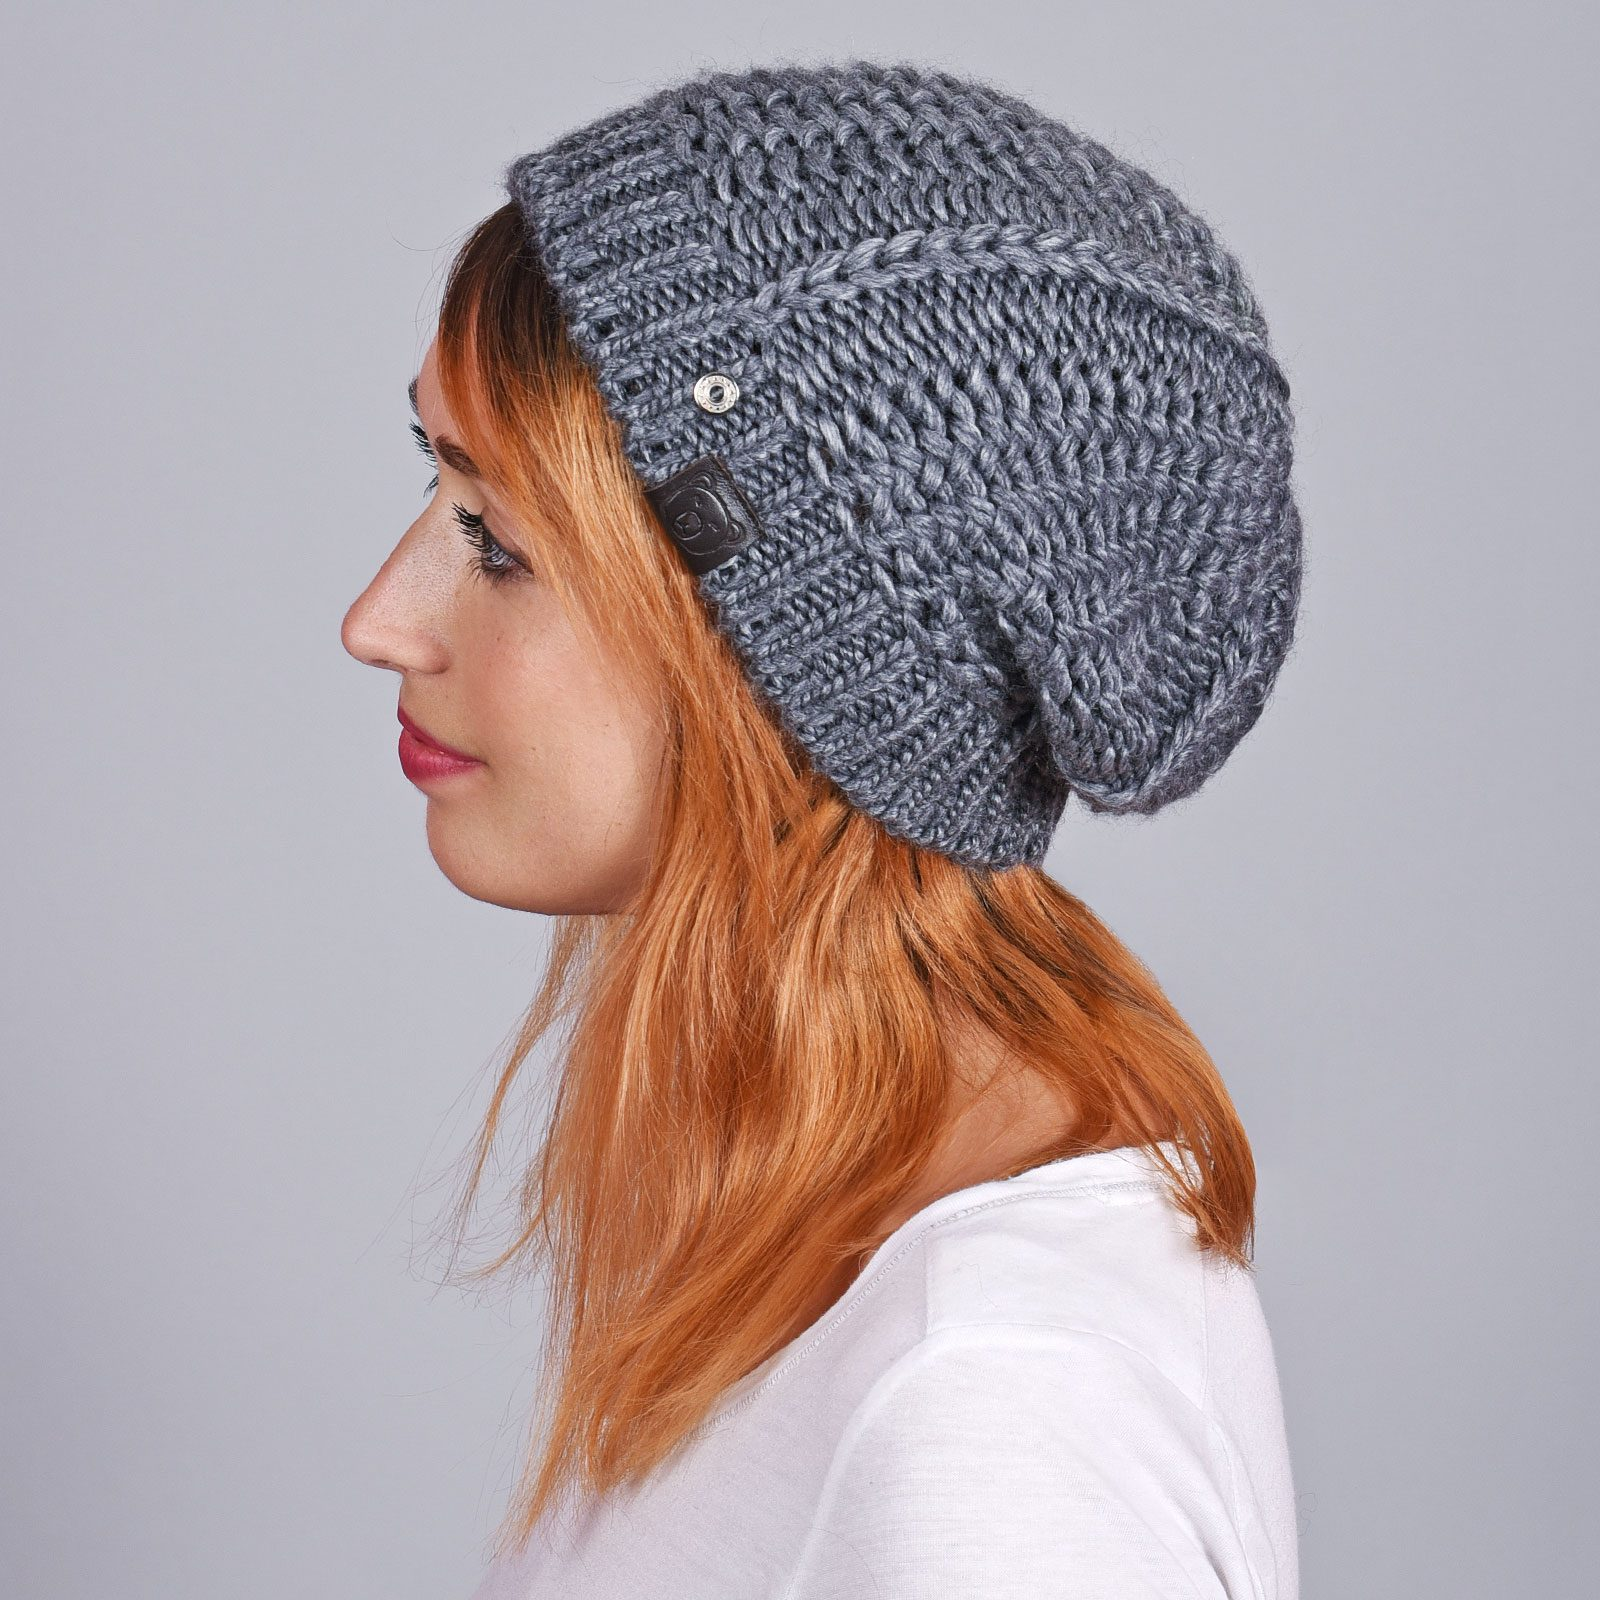 http://lookbook.allee-du-foulard.fr/wp-content/uploads/2019/01/CP-01069-VF16-1-bonnet-femme-gris-ardoise-1600x1600.jpg